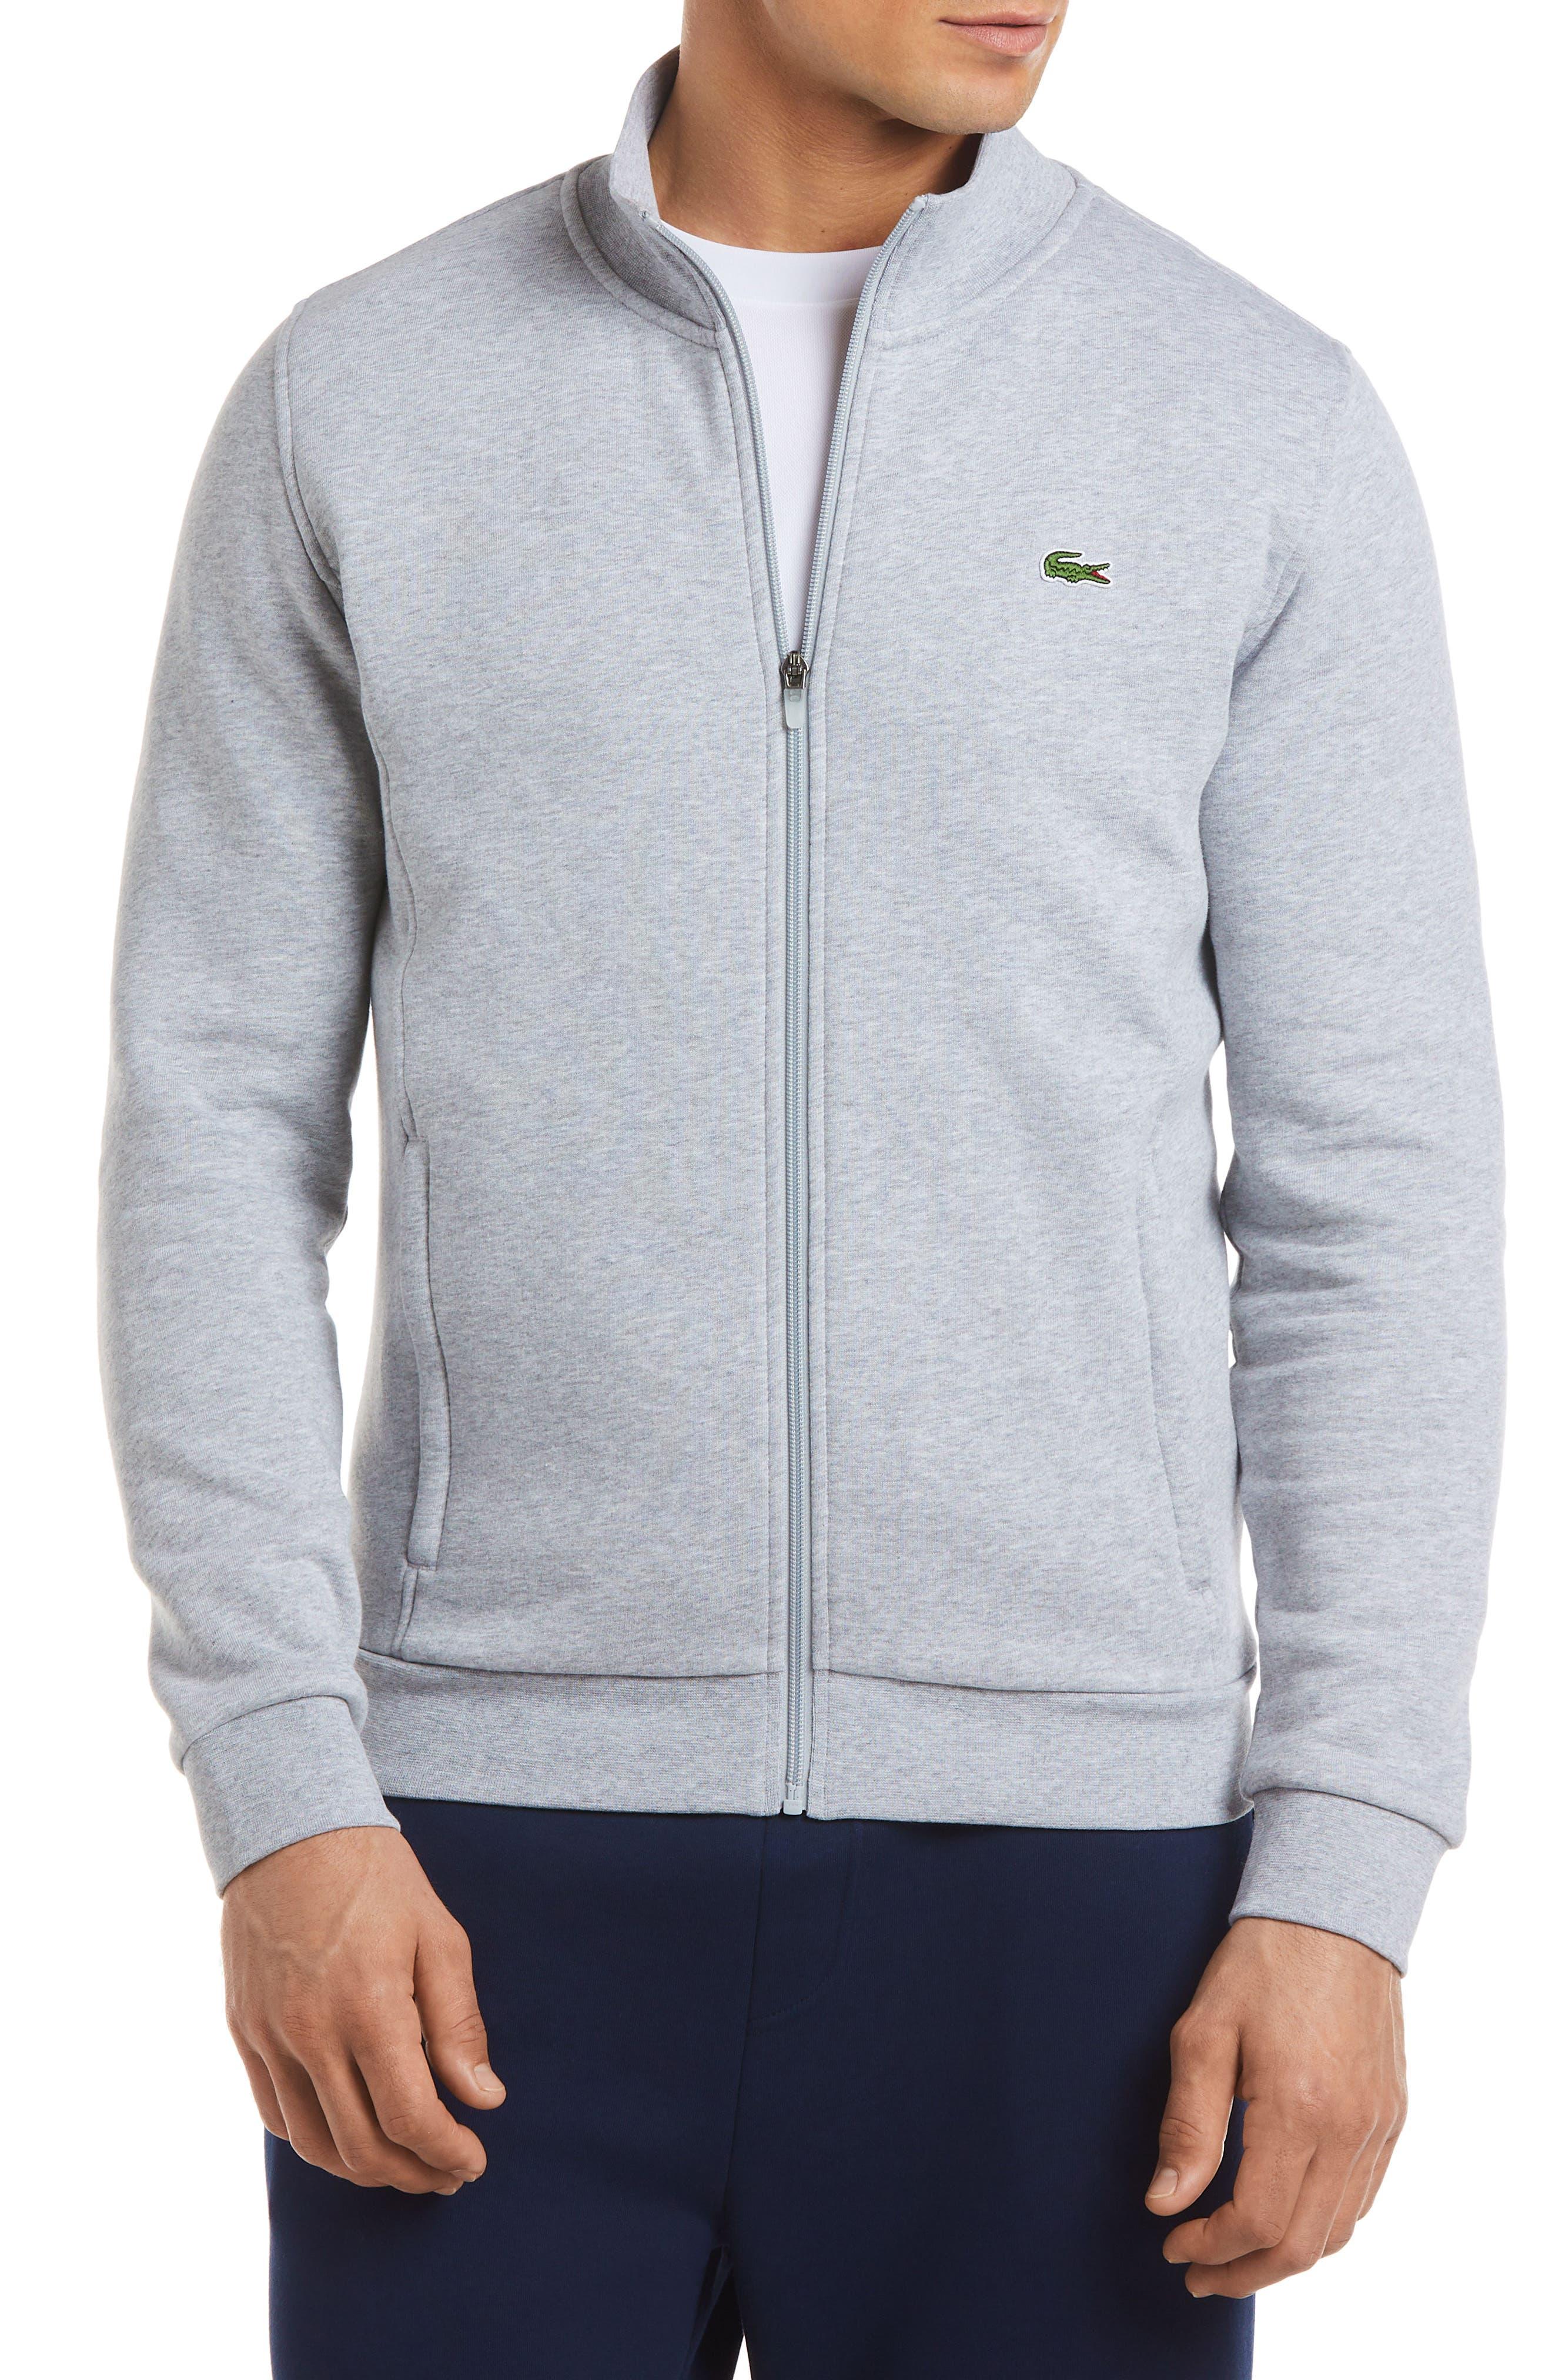 Lacoste Fleece Zip Jacket, Metallic